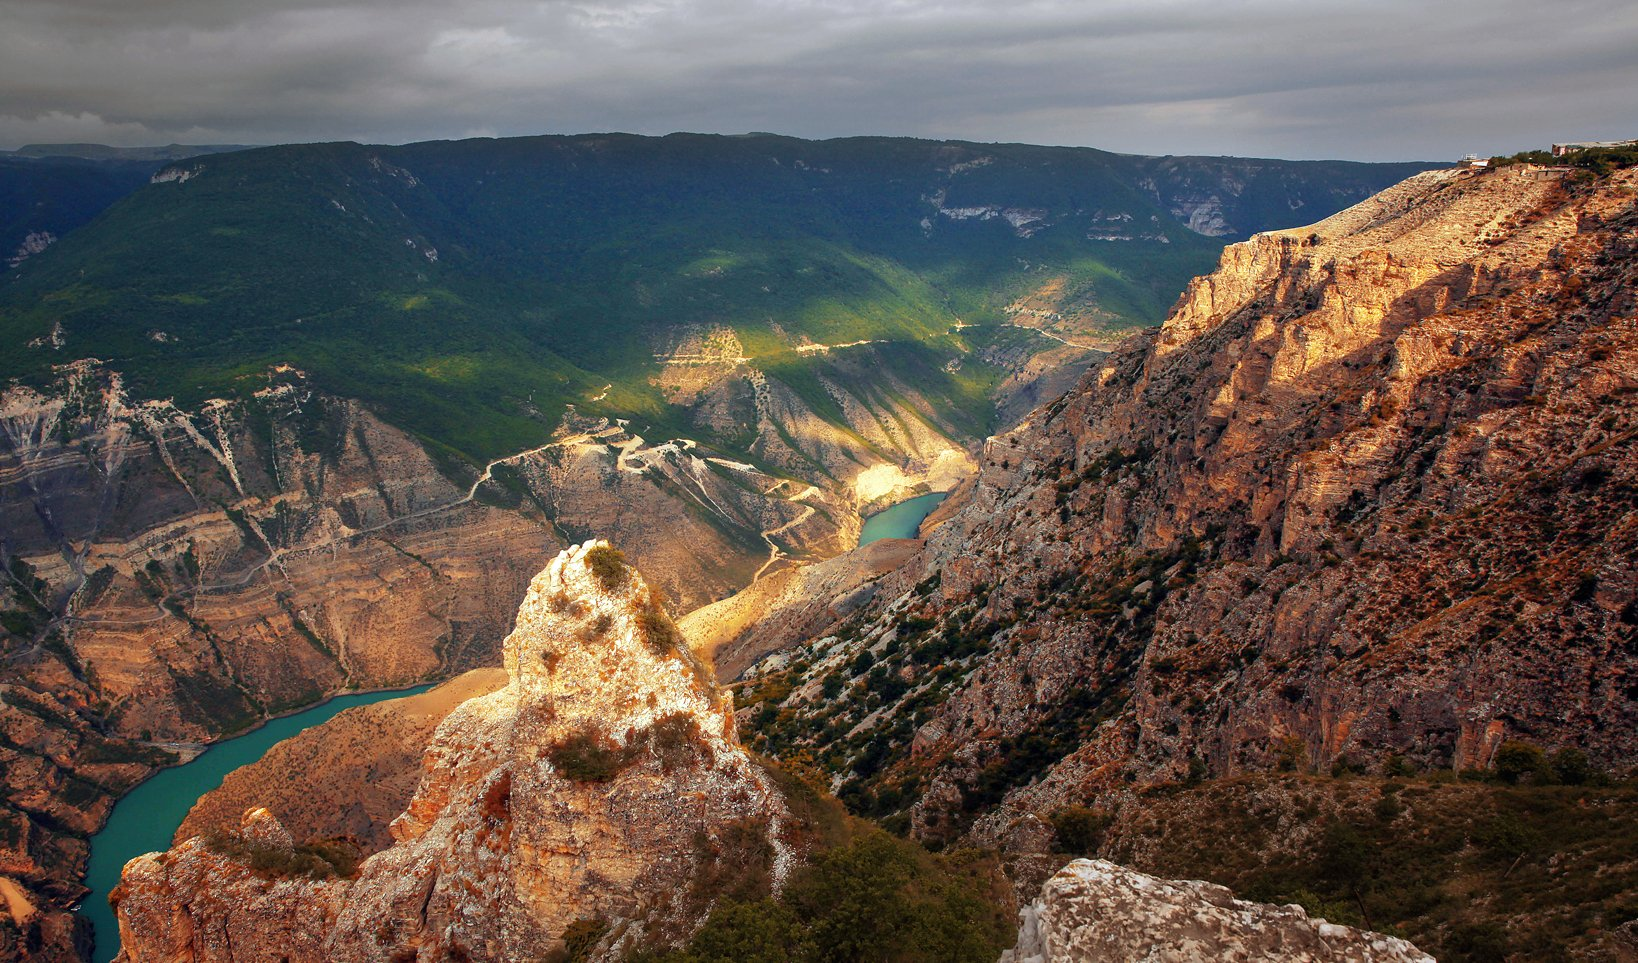 сулак,каньон,река,вода,горы,дагестан., Magov Marat